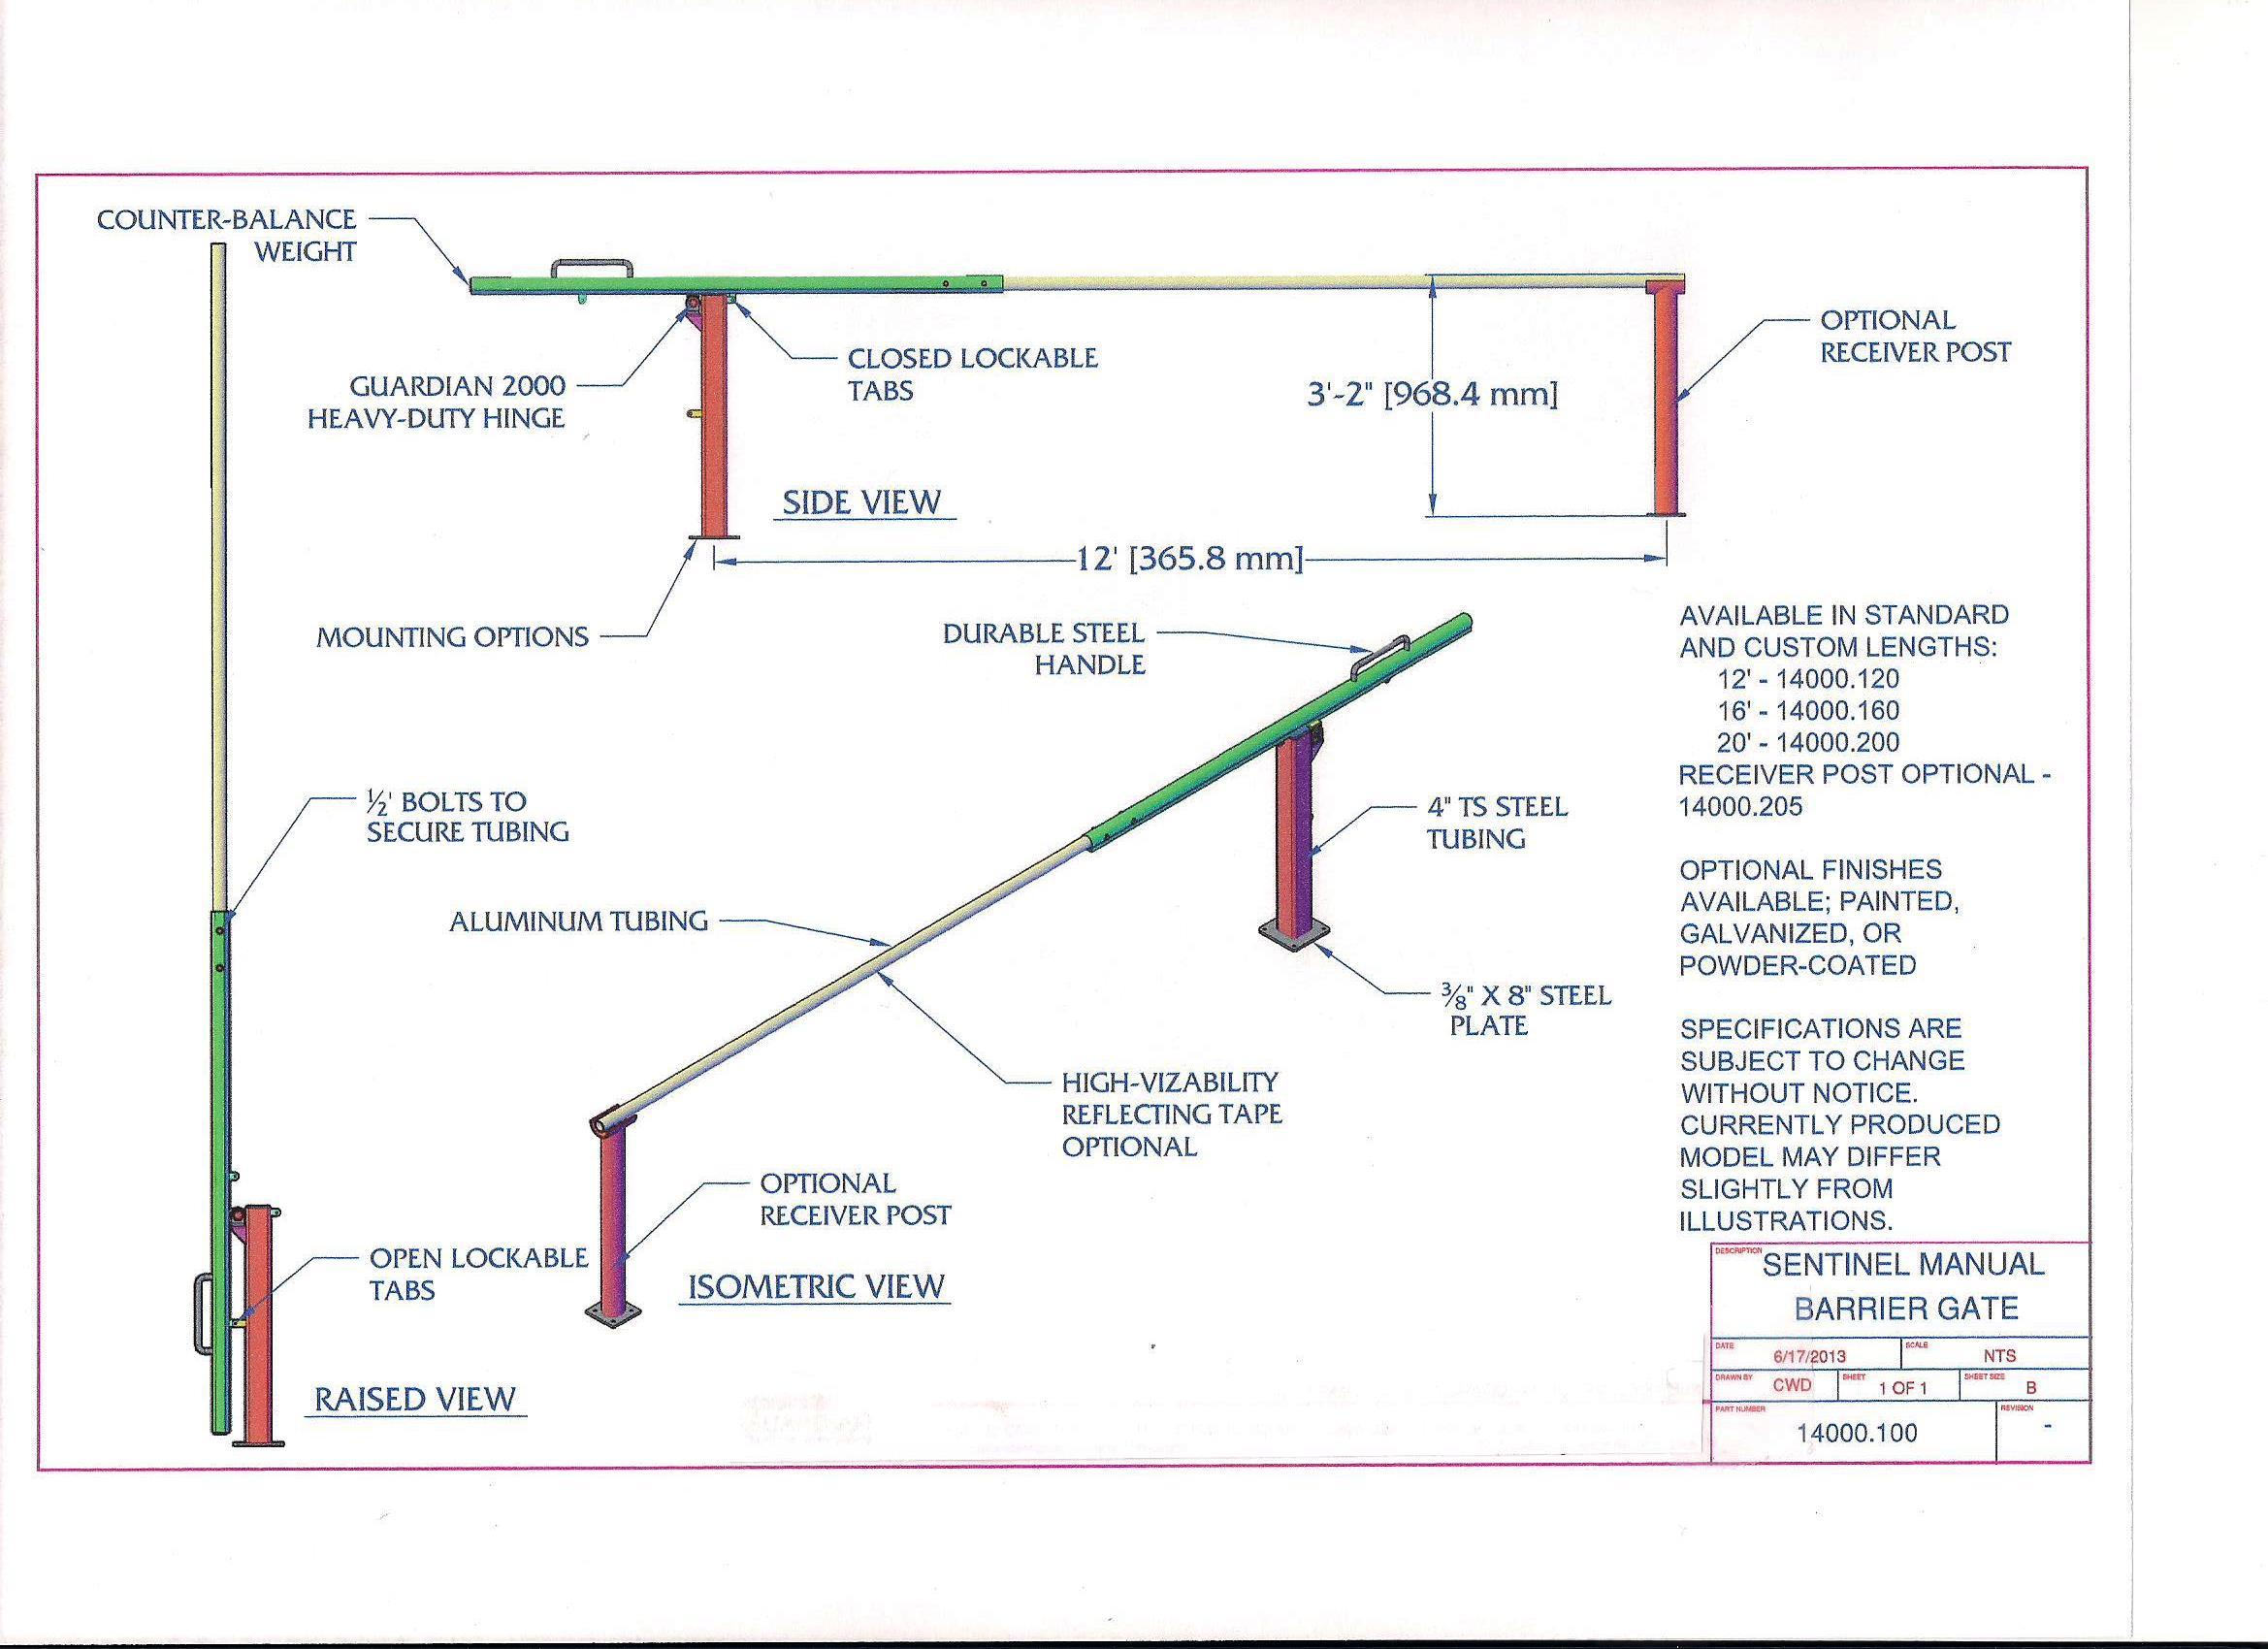 Manual_Barrier_Gate_Arm_2013?resize=665%2C484 upright mx19 scissor lift wiring diagram upright x20n scissor upright mx19 wiring diagram at alyssarenee.co